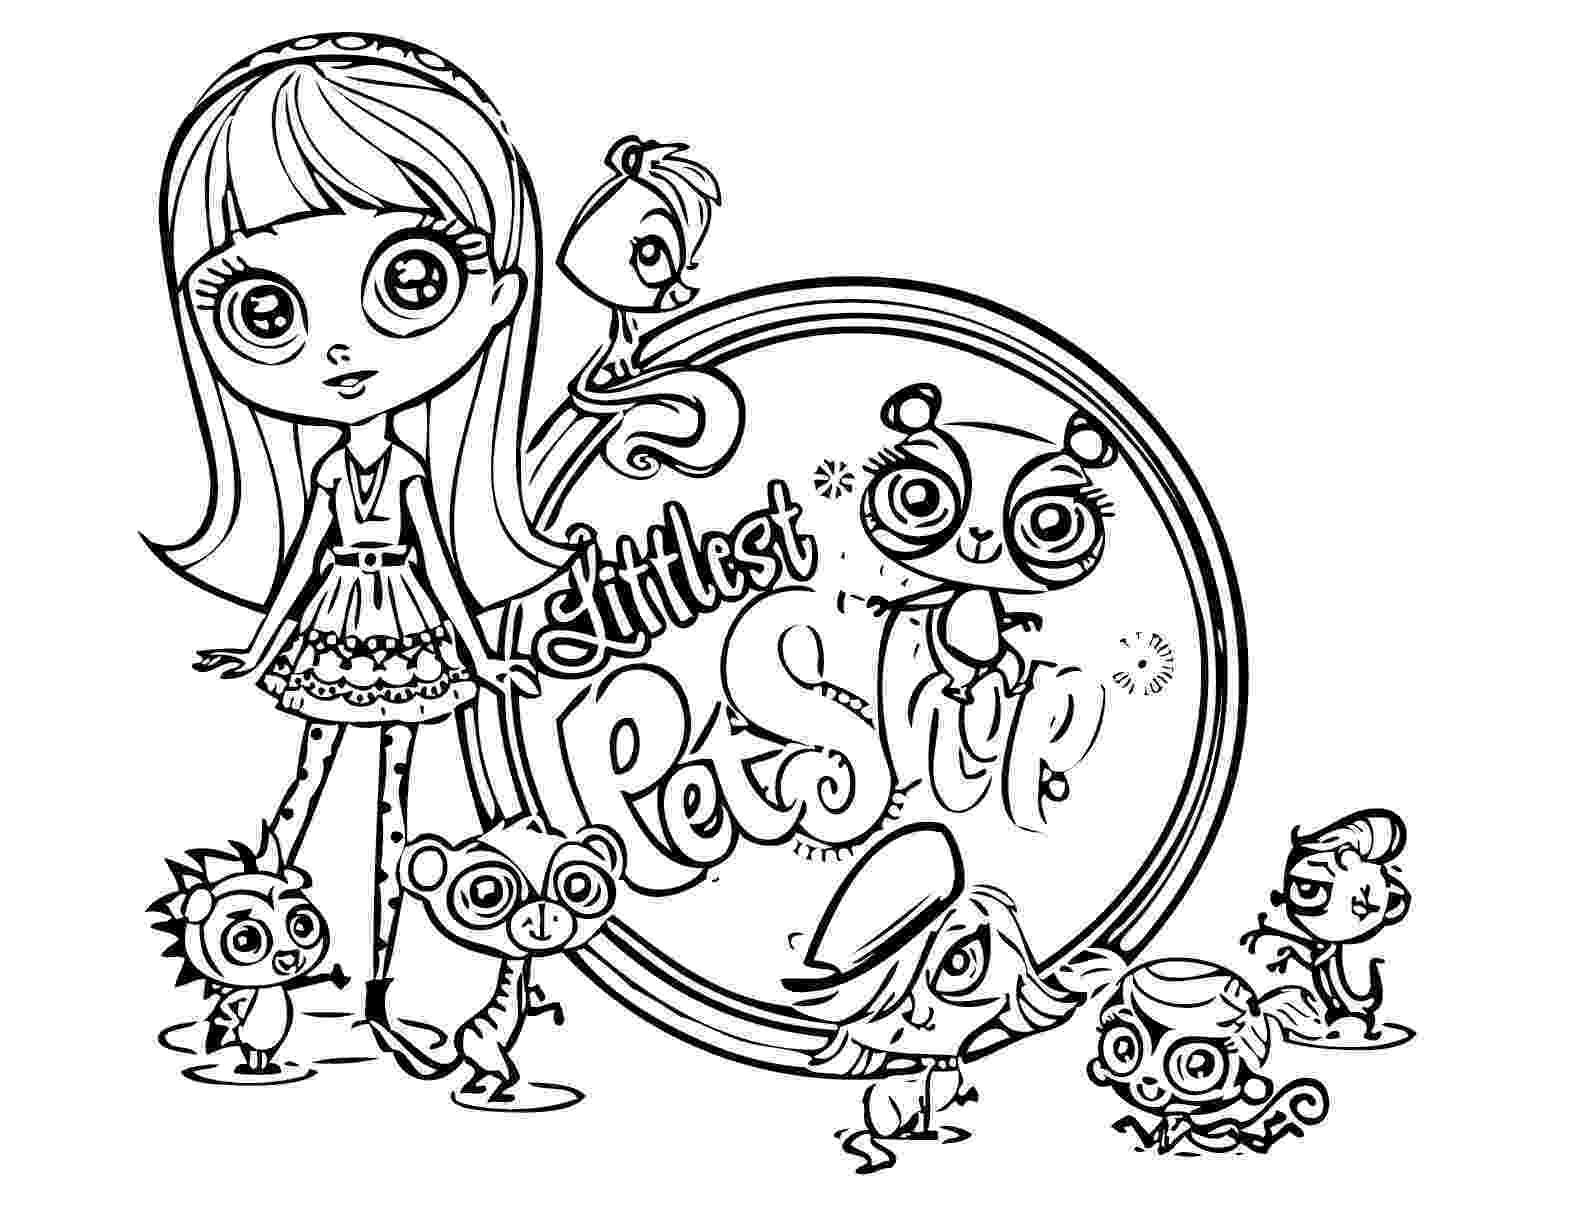 coloring pages my little pet shop coloring pages my little pet shop coloring home pages little shop pet coloring my